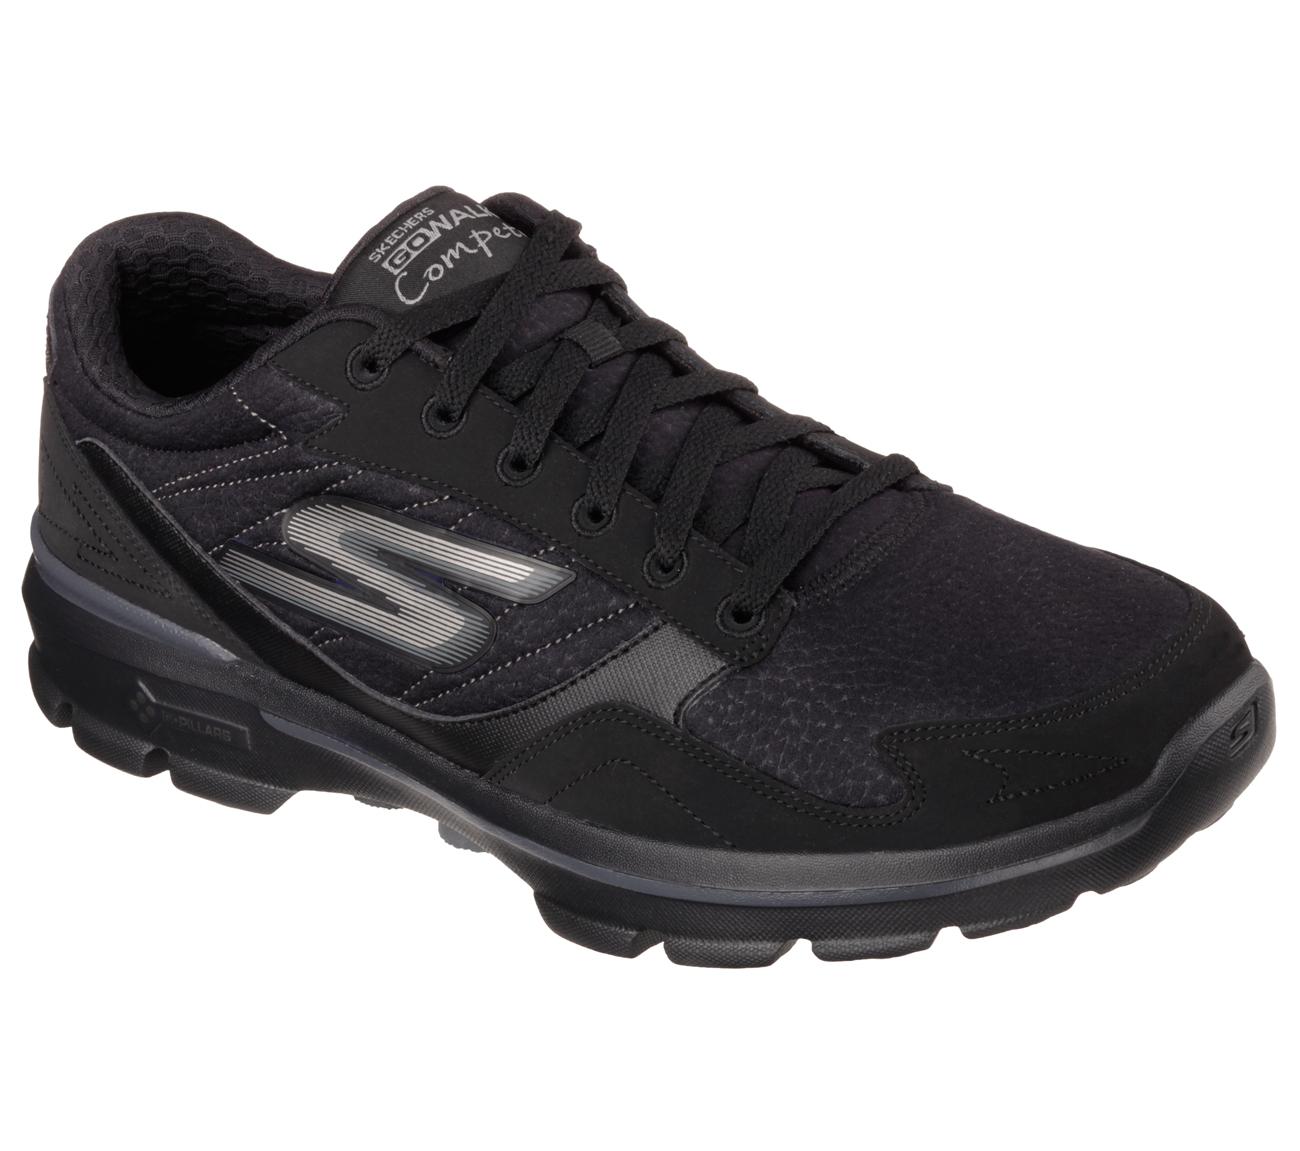 Buy Skechers Skechers Gowalk 3 Compete Lt Skechers